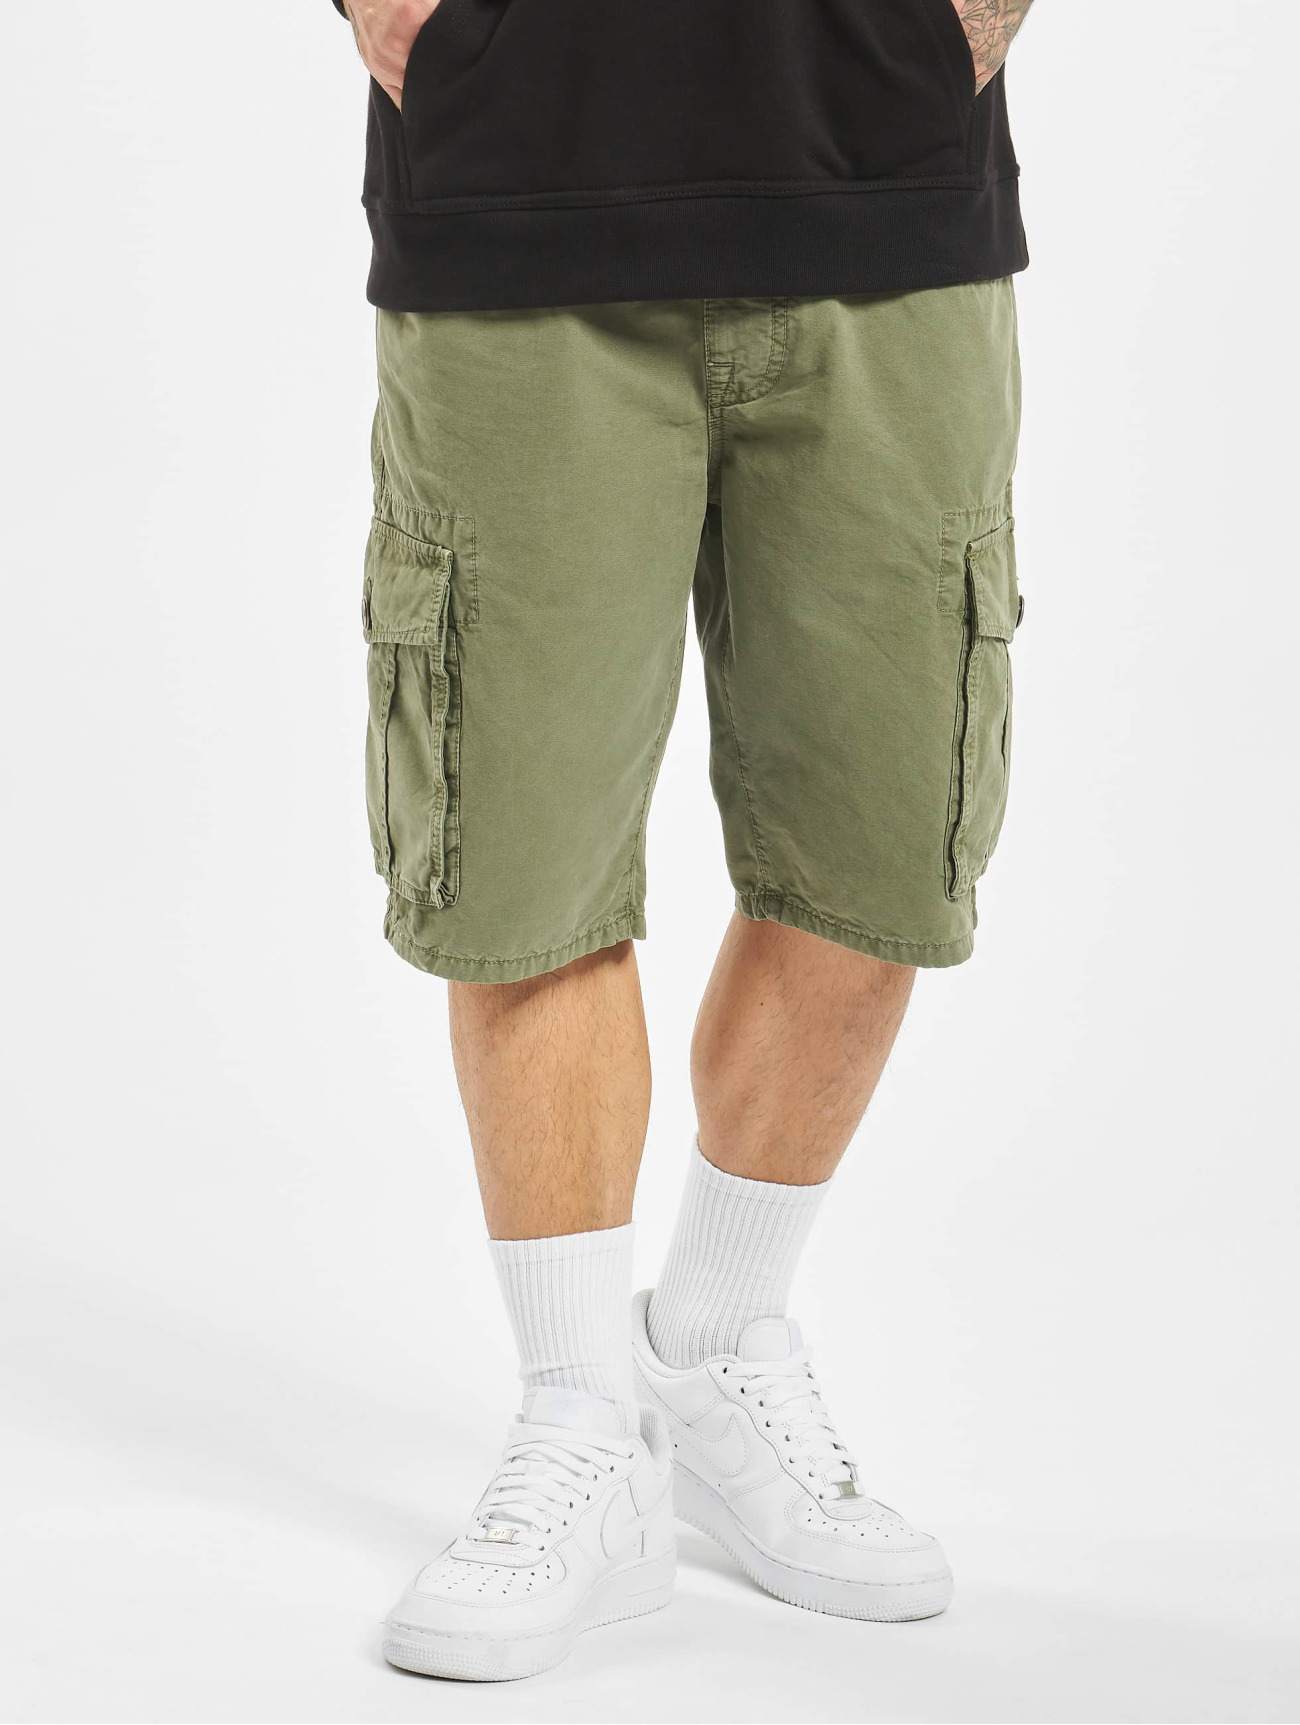 Mavi Jeans  Cargo   olive Homme Short  604437 Homme Pantalons & Shorts